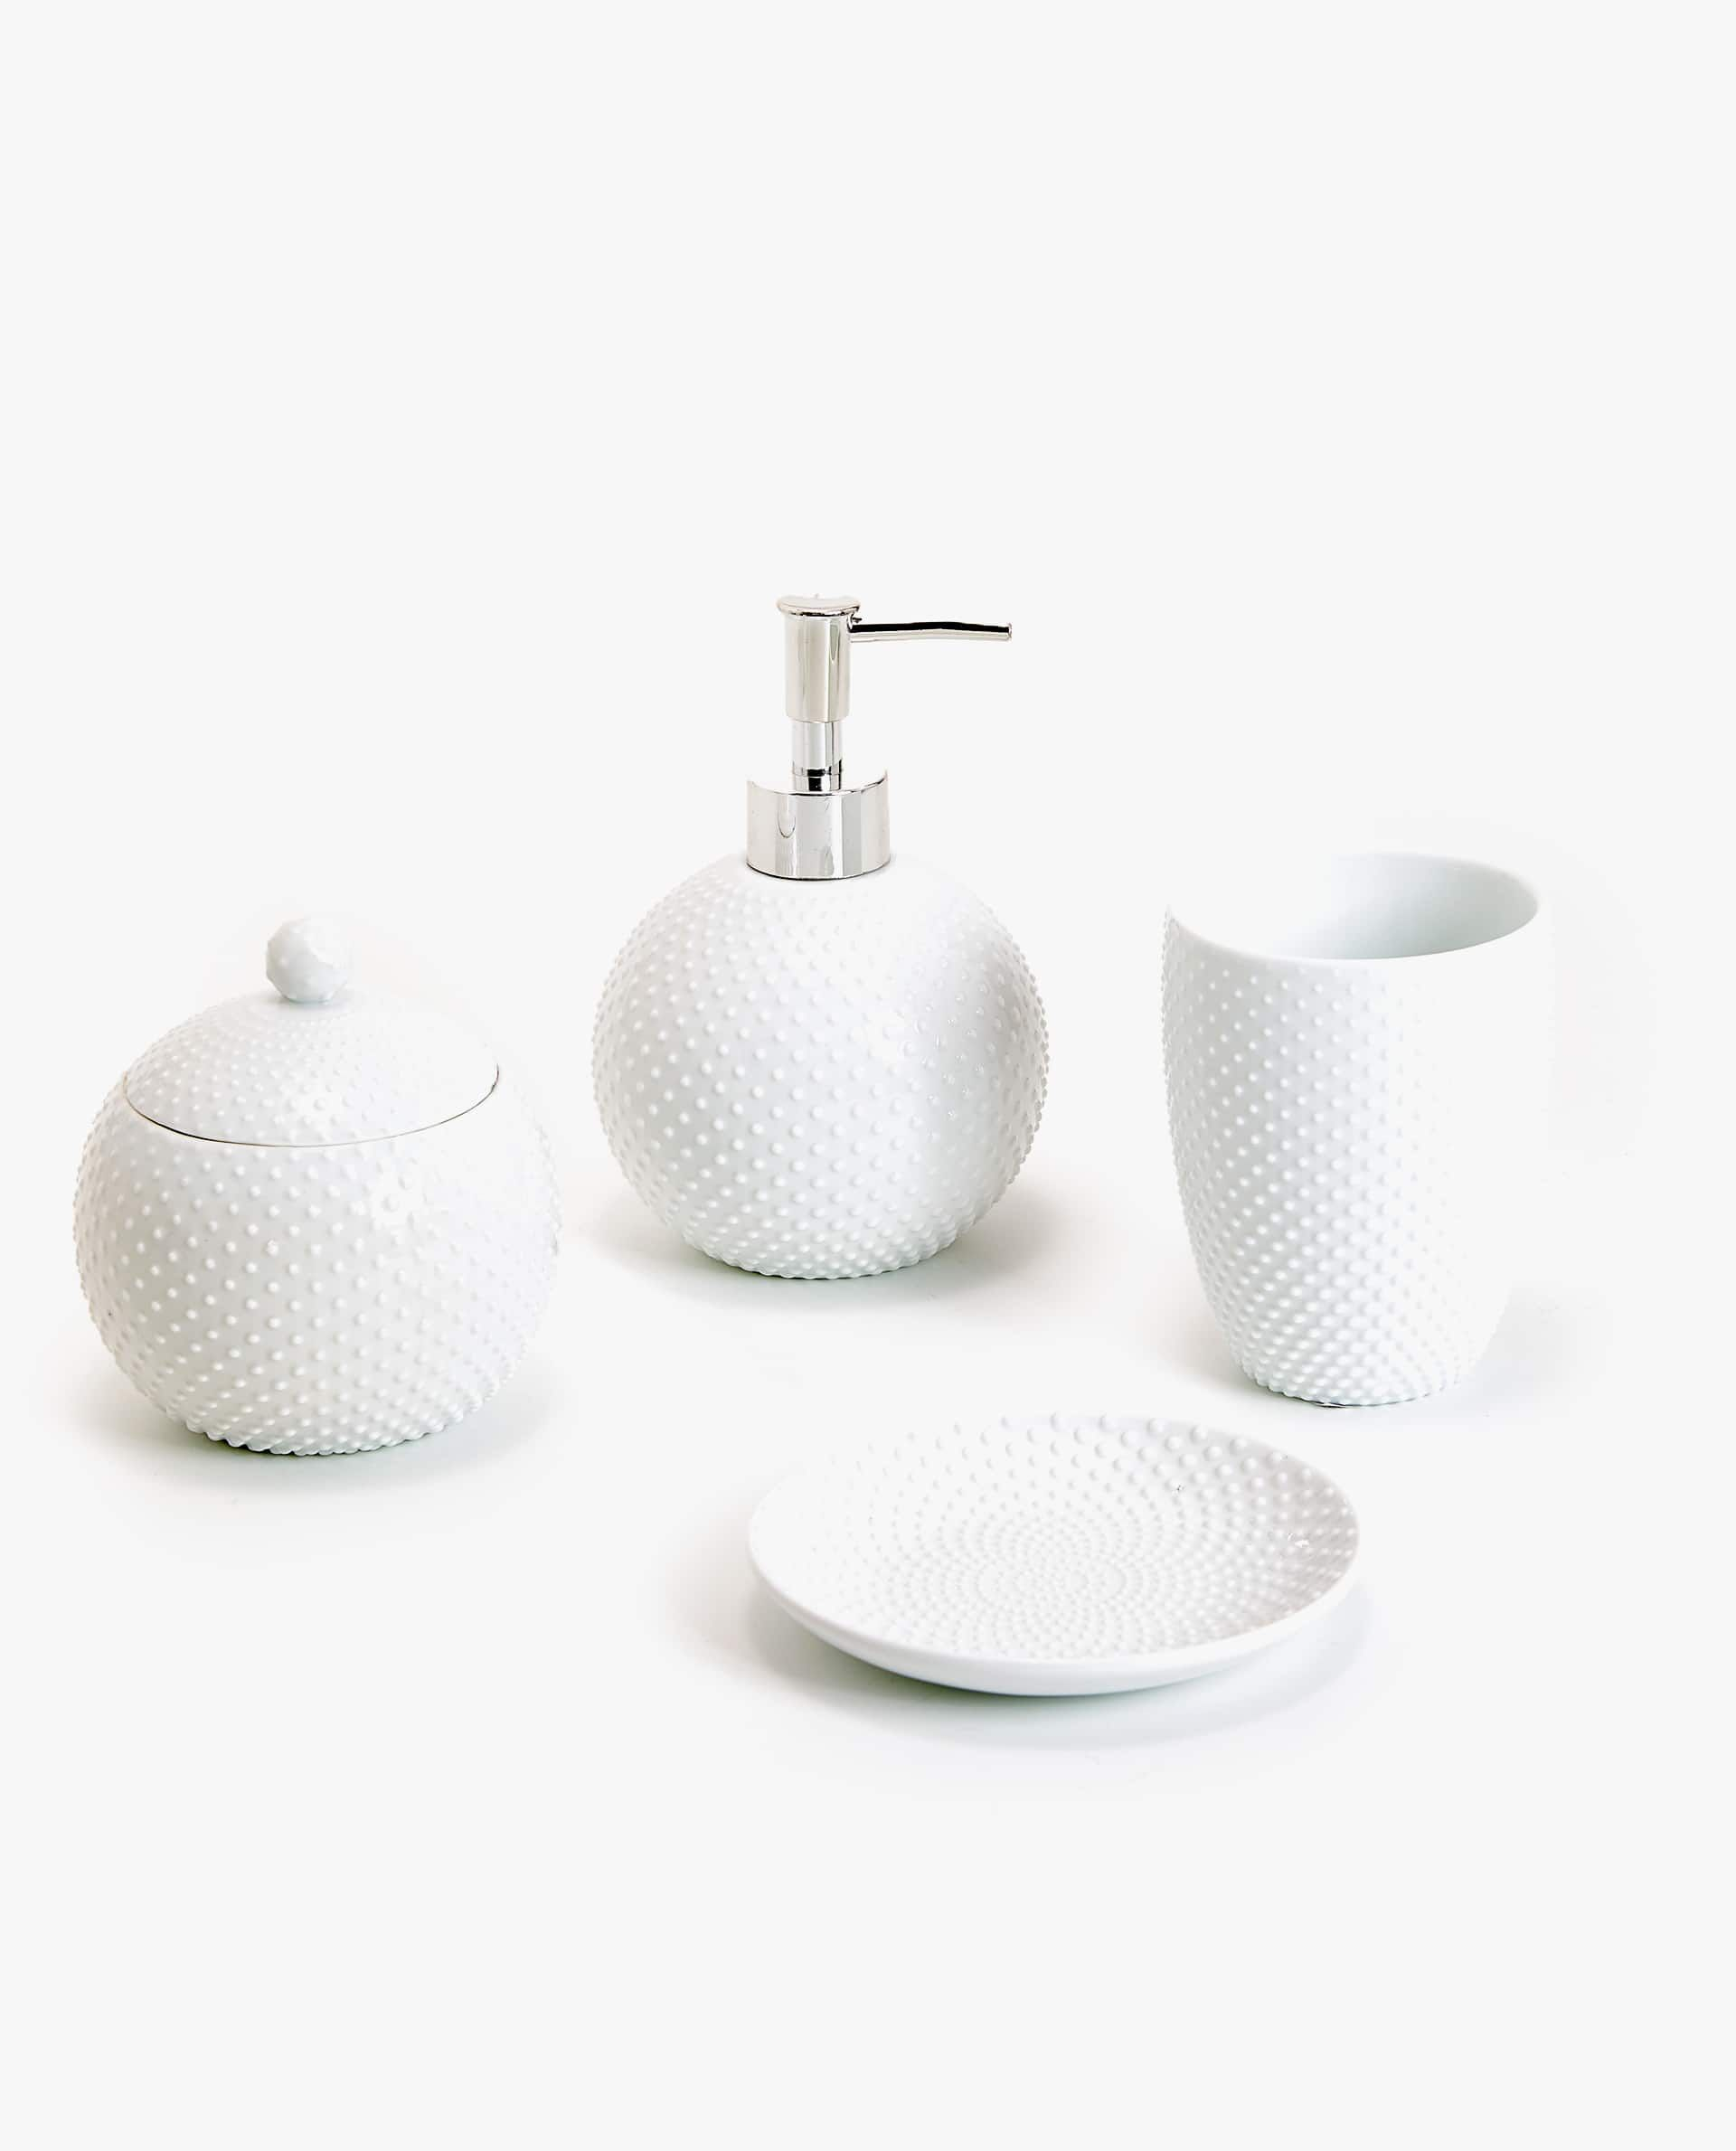 Ensemble De Bain Ceramique Pois Accessoires De Bain Salle De Bain Zara Home France Soap Dispenser Soap Dispenser